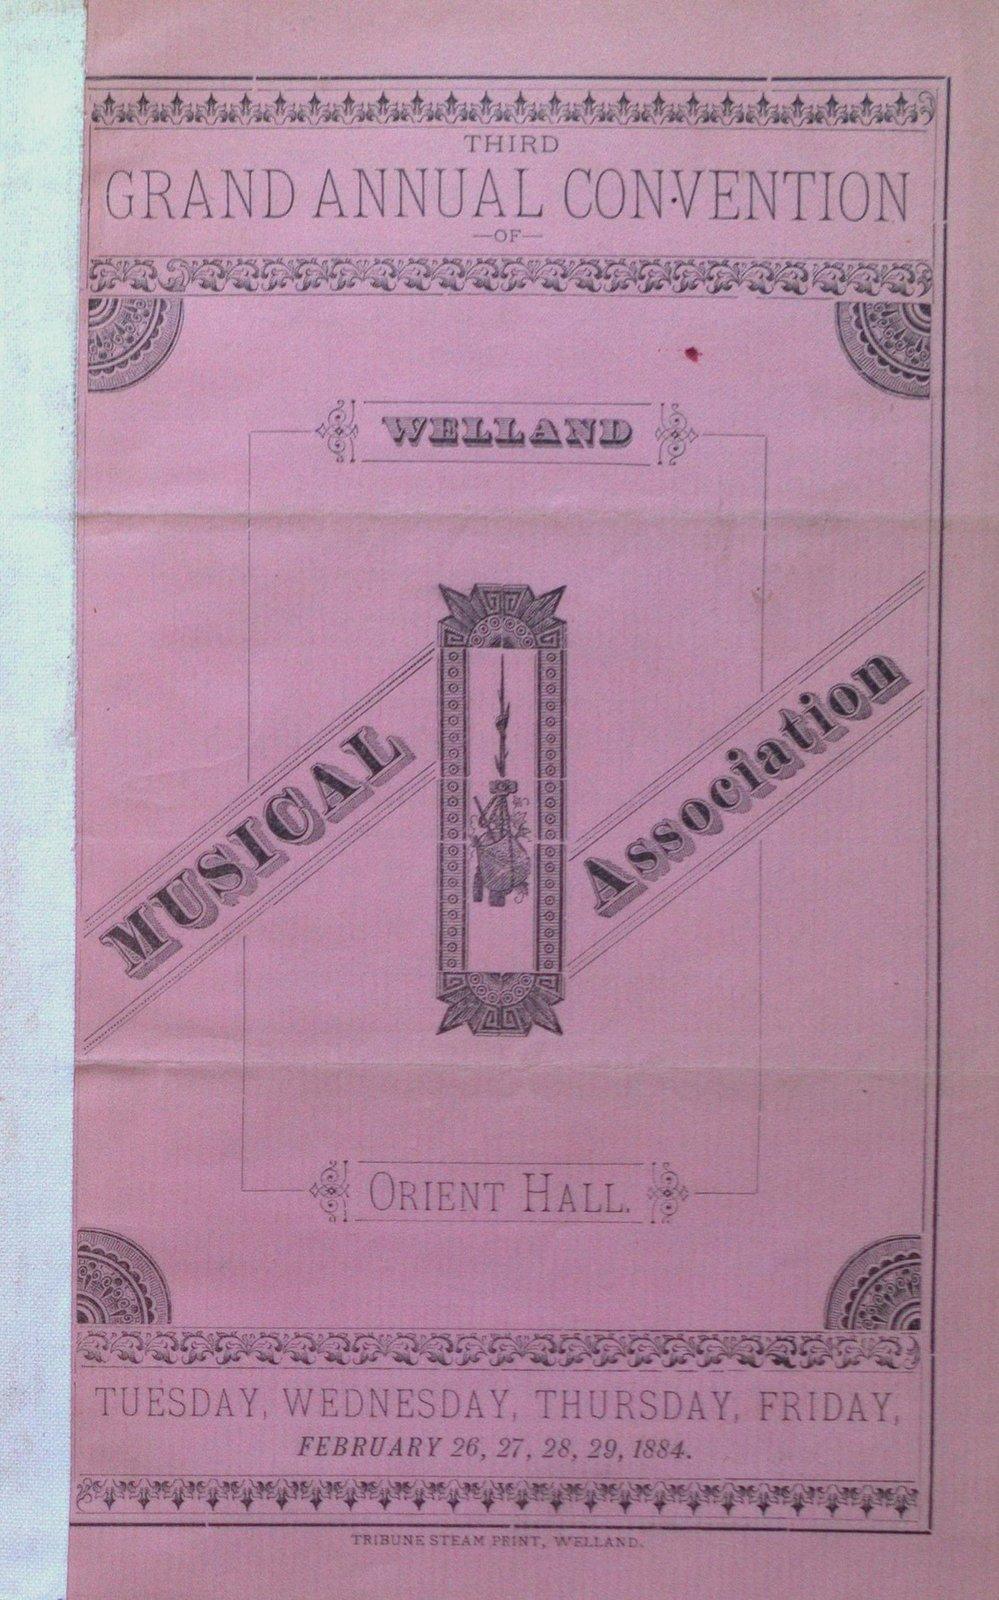 Teresa Vanderburgh's Musical Scrapbook #1 - Welland Musical Association, Third Grand Annual Convention